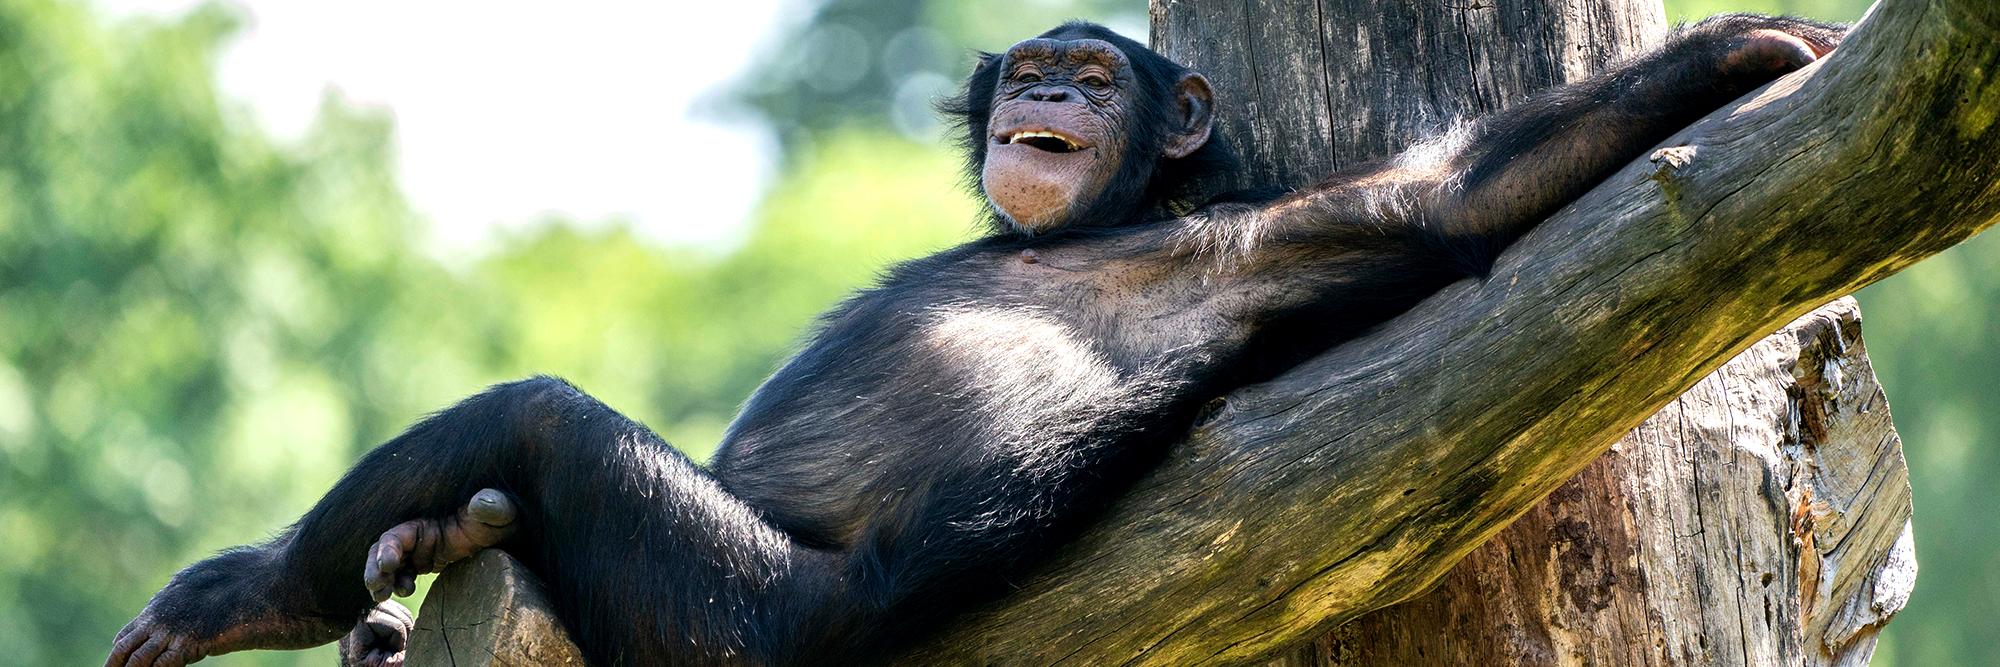 Dein Tag Als Affenpfleger